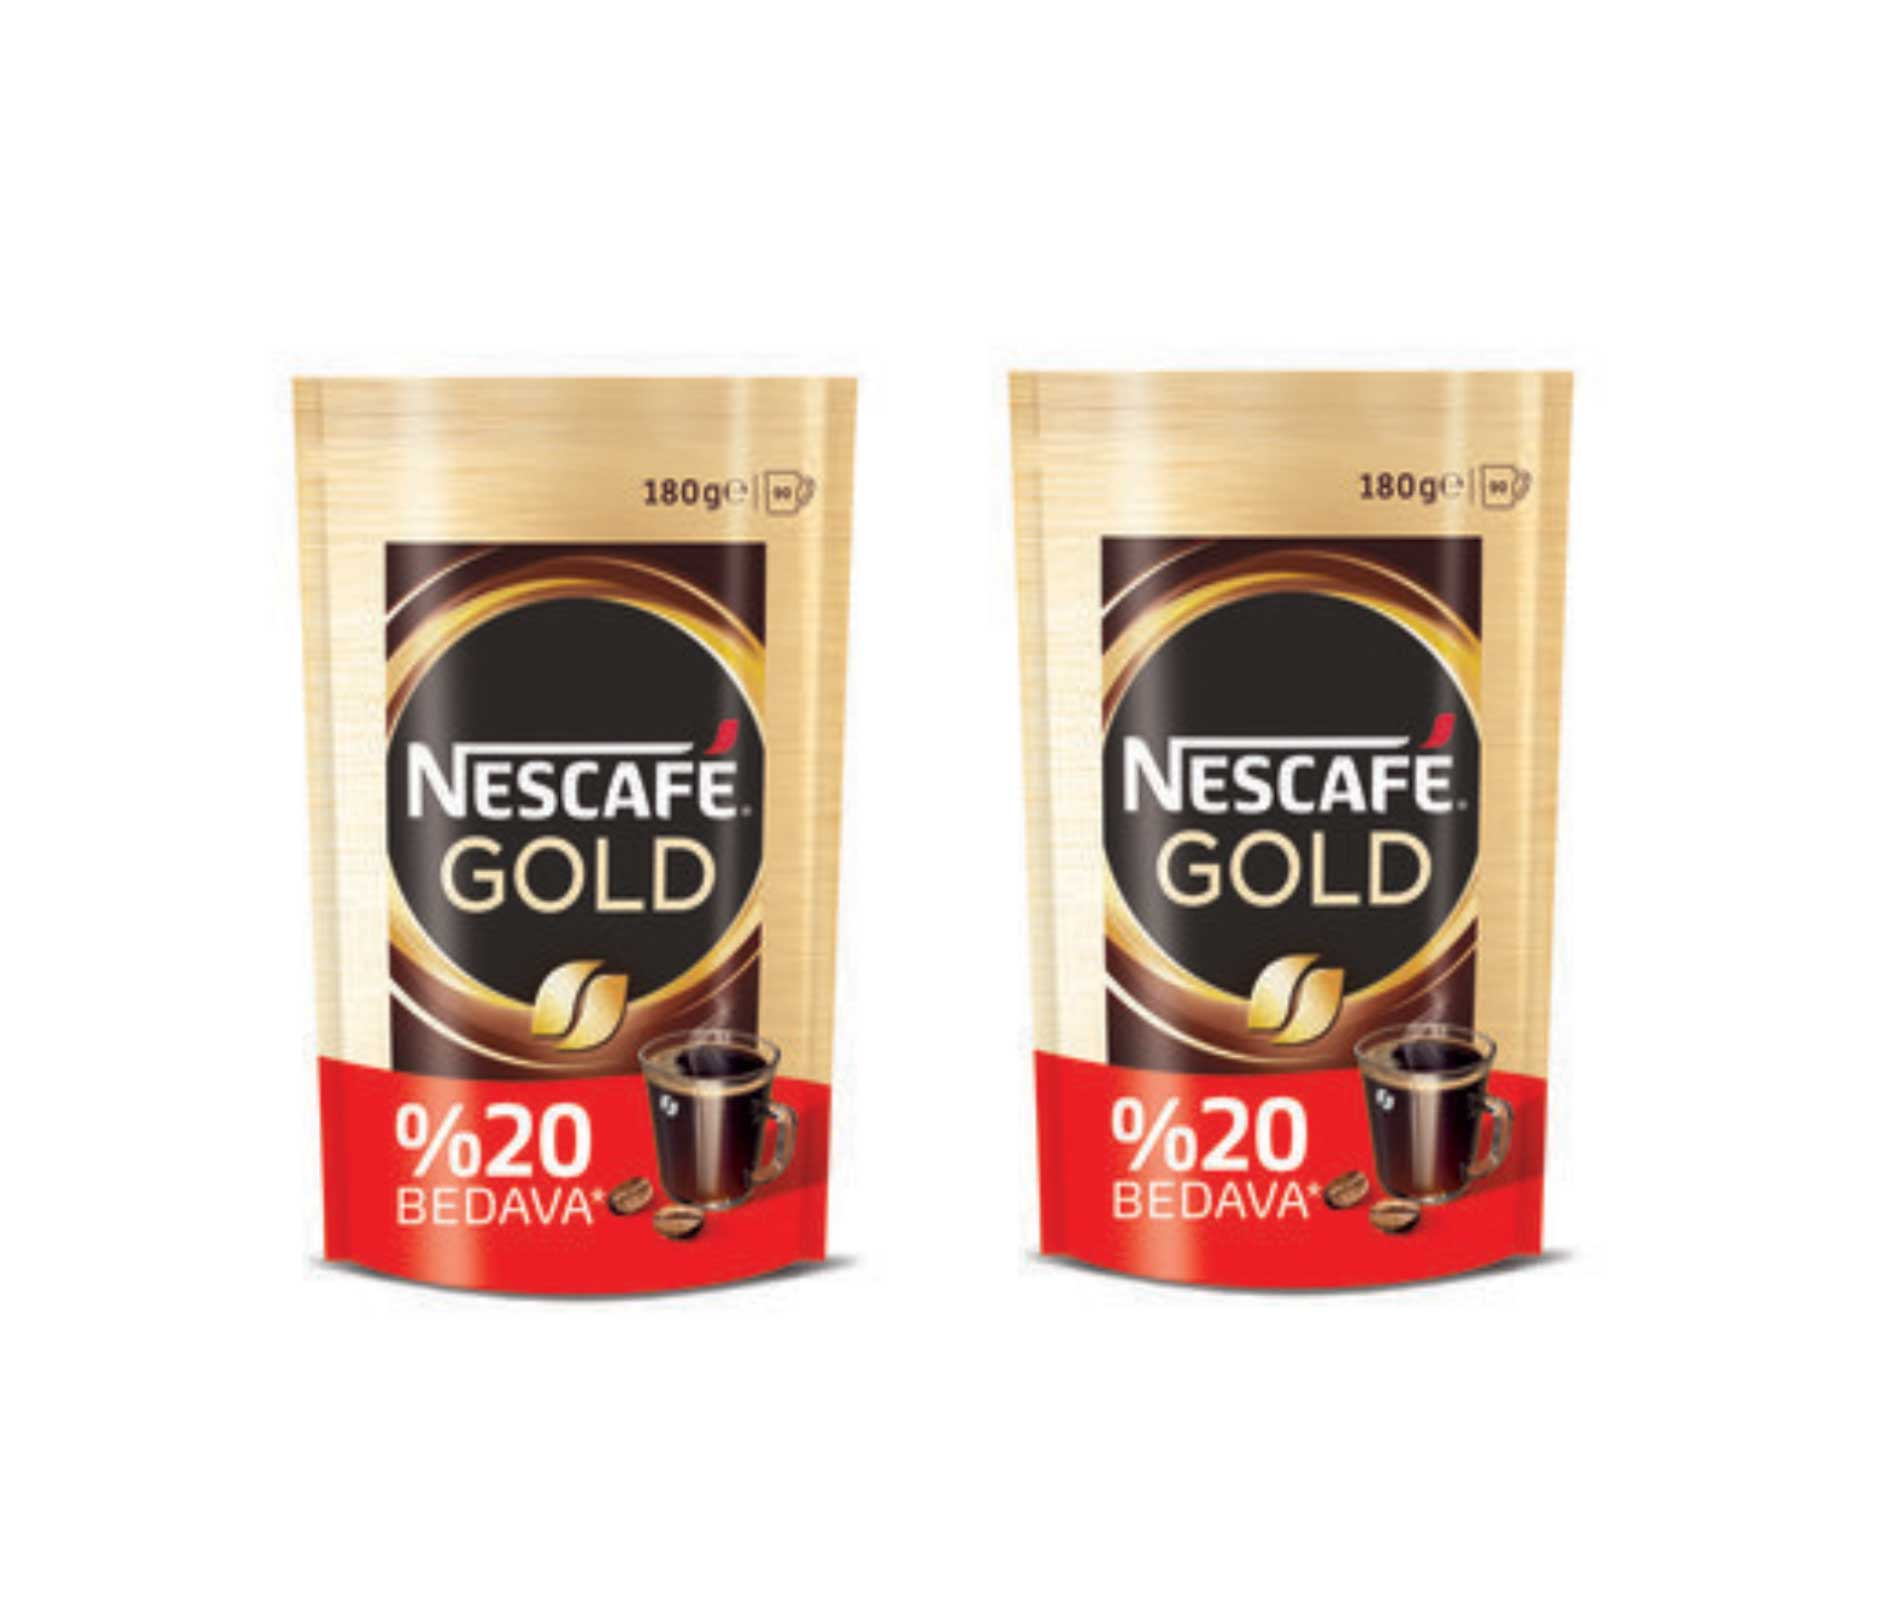 Nescafe Gold Hazır Kahve 180 Gr X 2 Adet